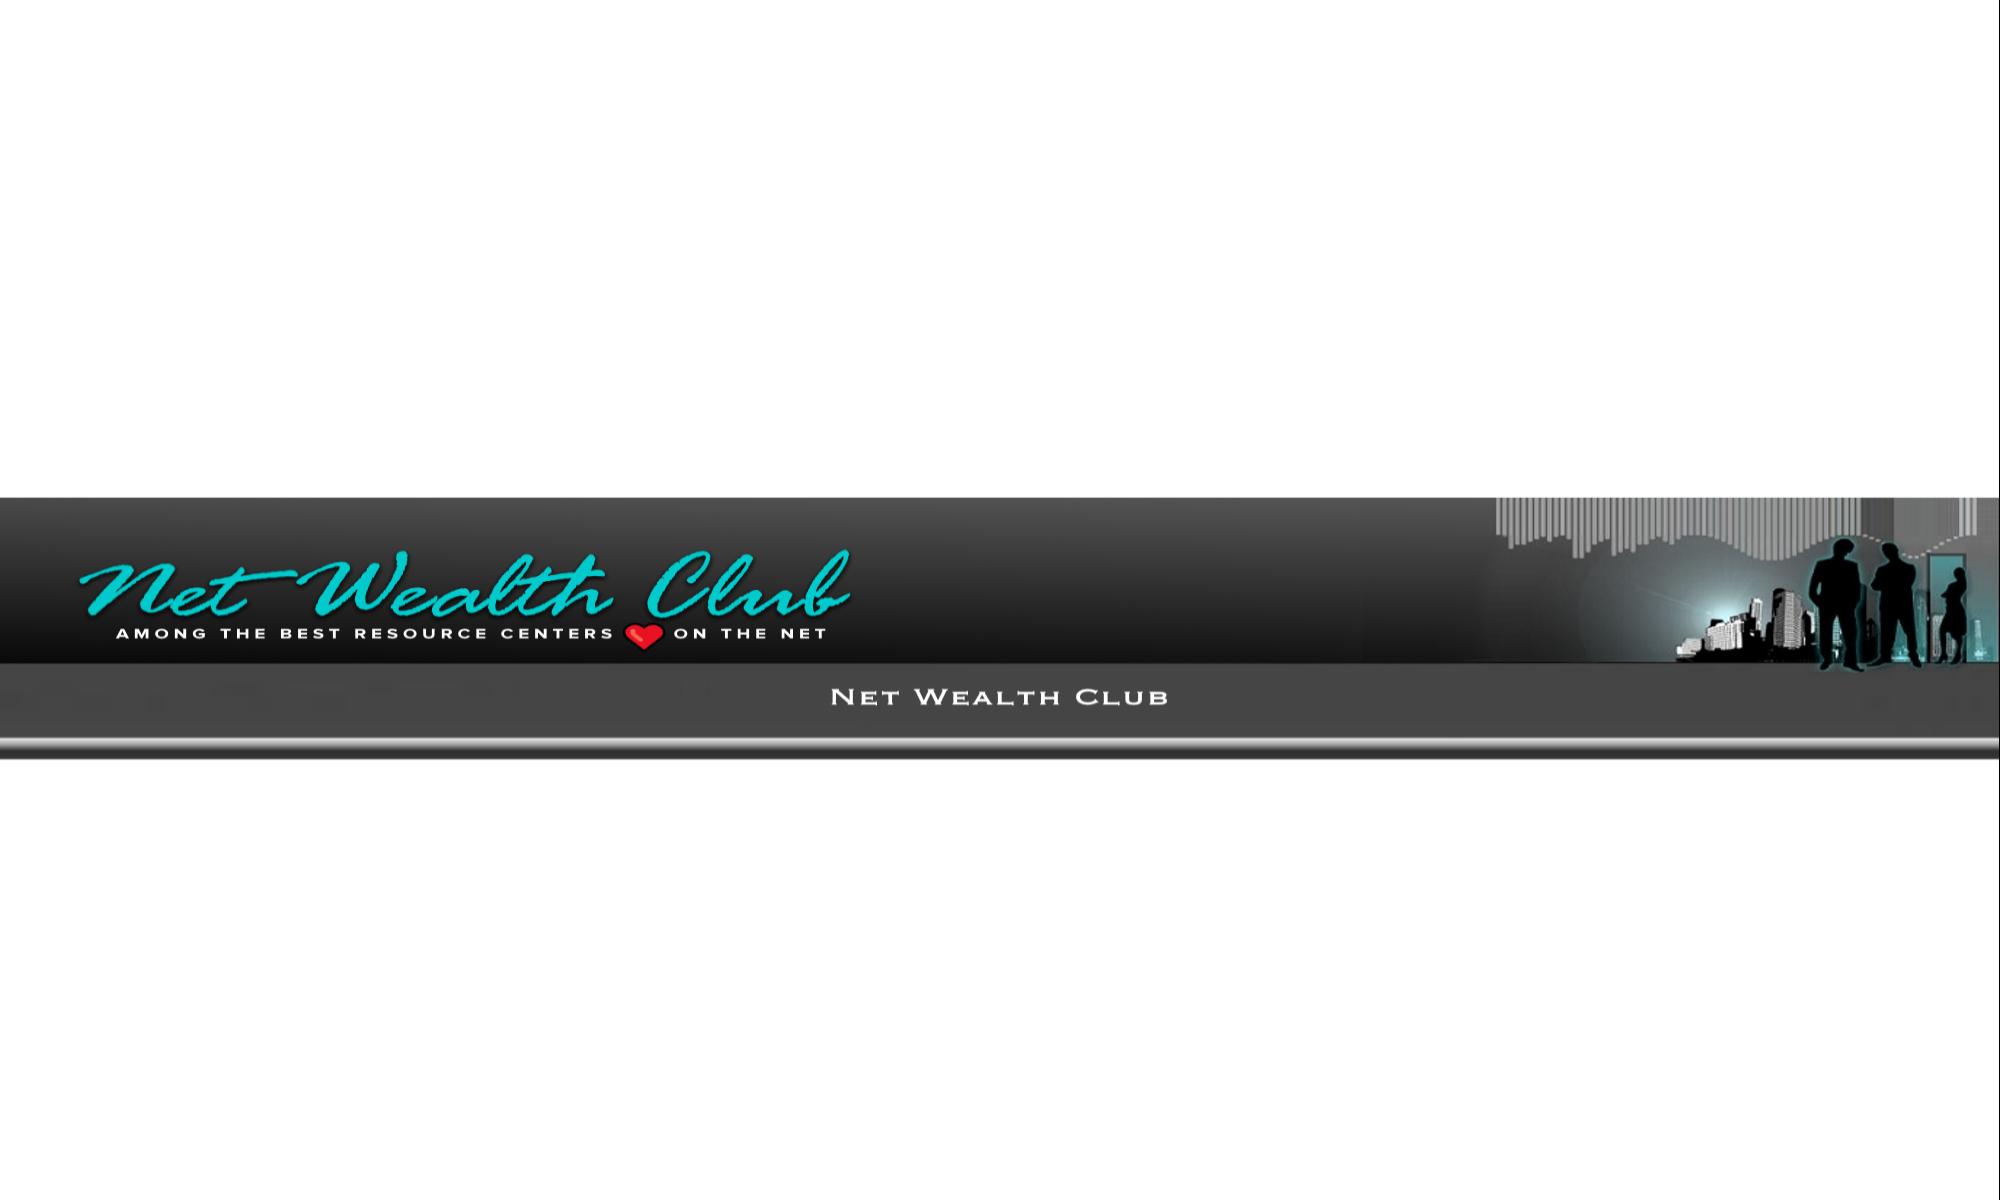 Net Wealth Club